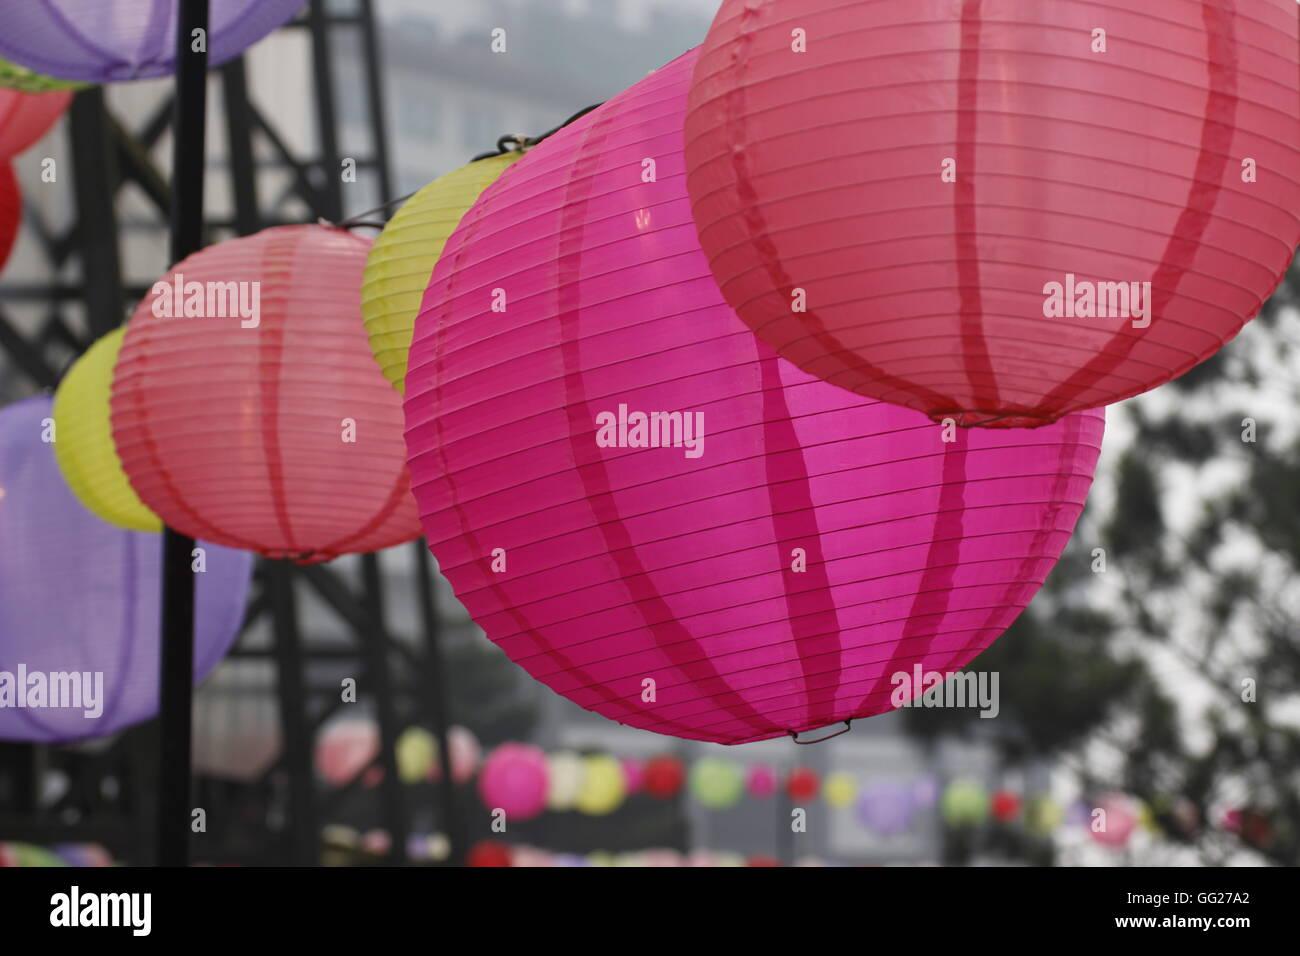 round colorful paper lanterns - Stock Image